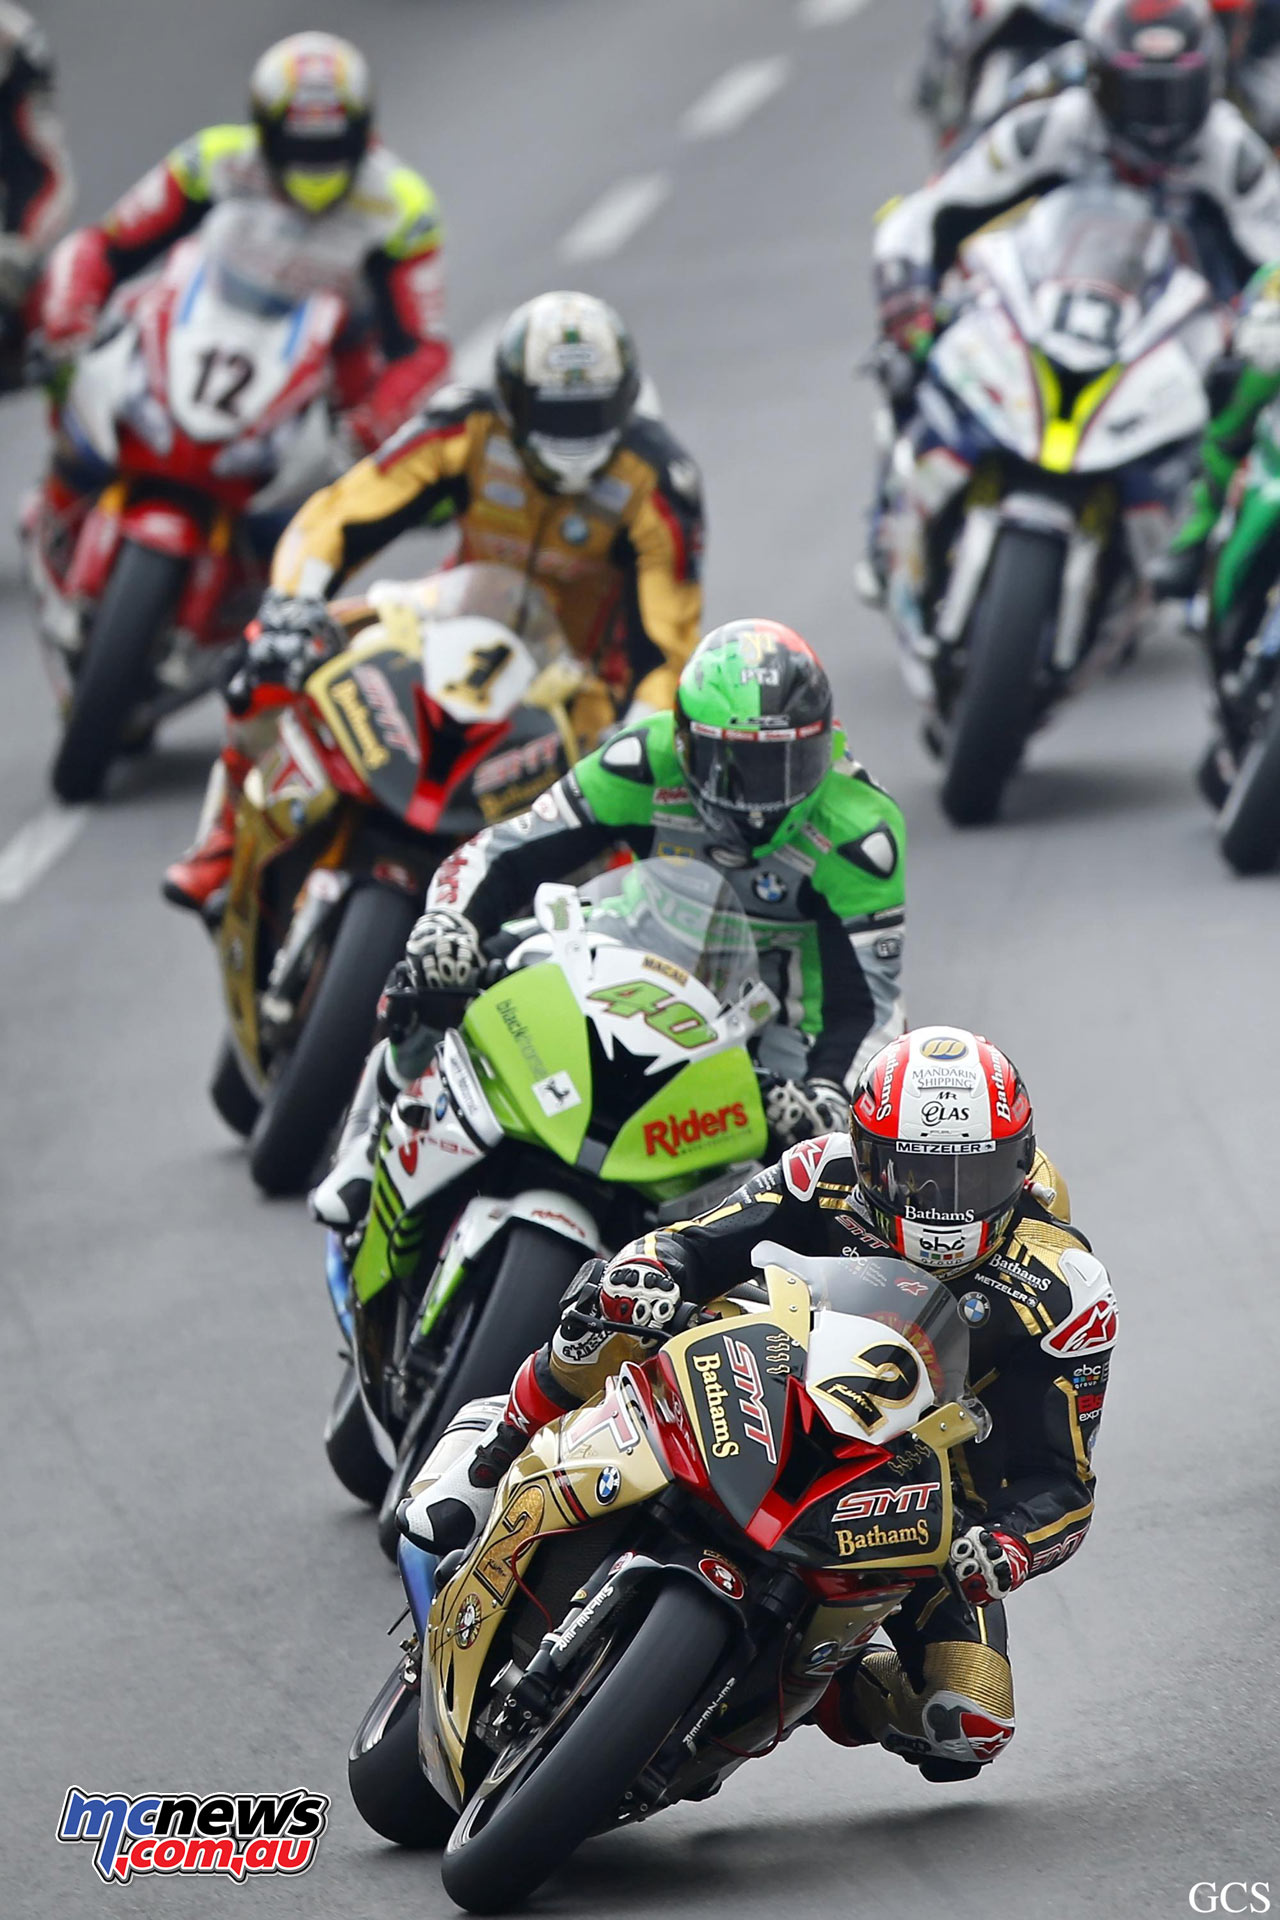 Moto GP : Grand Prix dAutriche en direct - LÉquipe